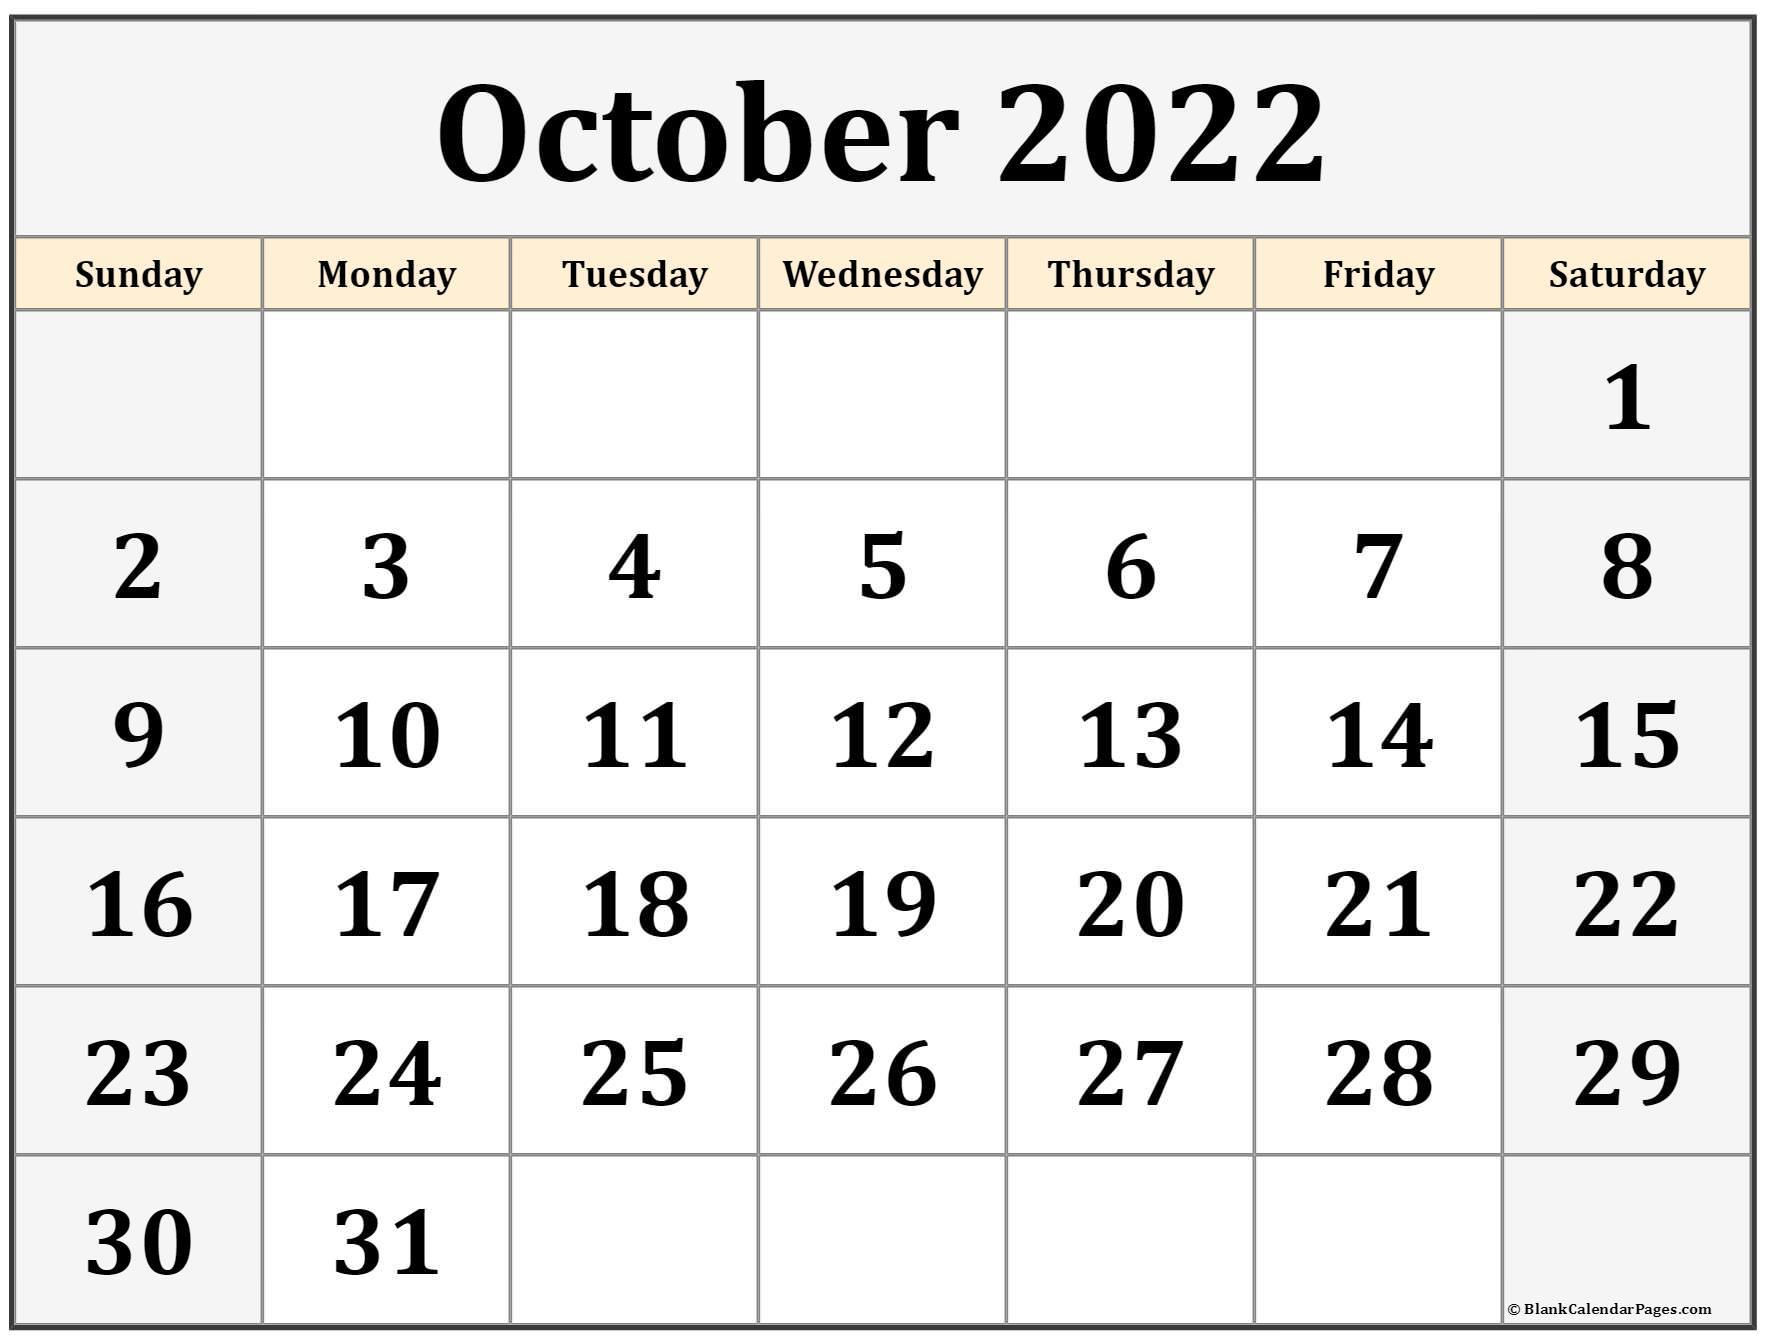 October 2022 calendar   free printable monthly calendars